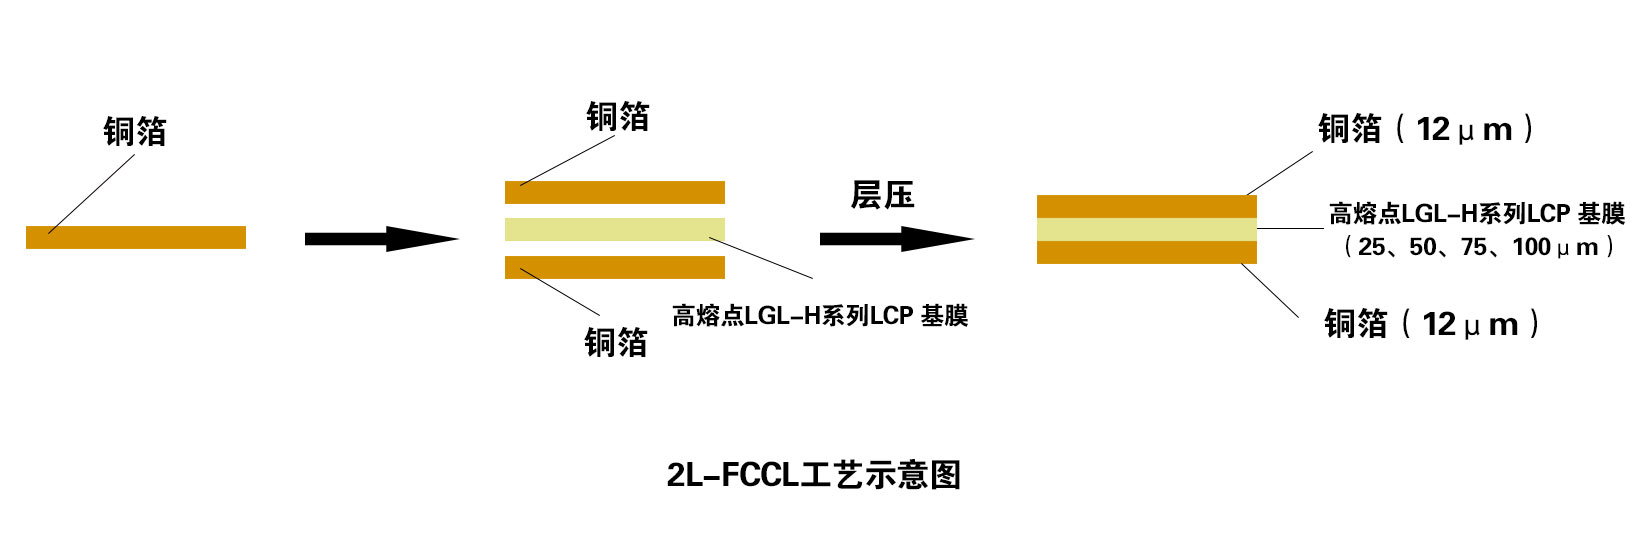 2L-FCCL工艺示意图